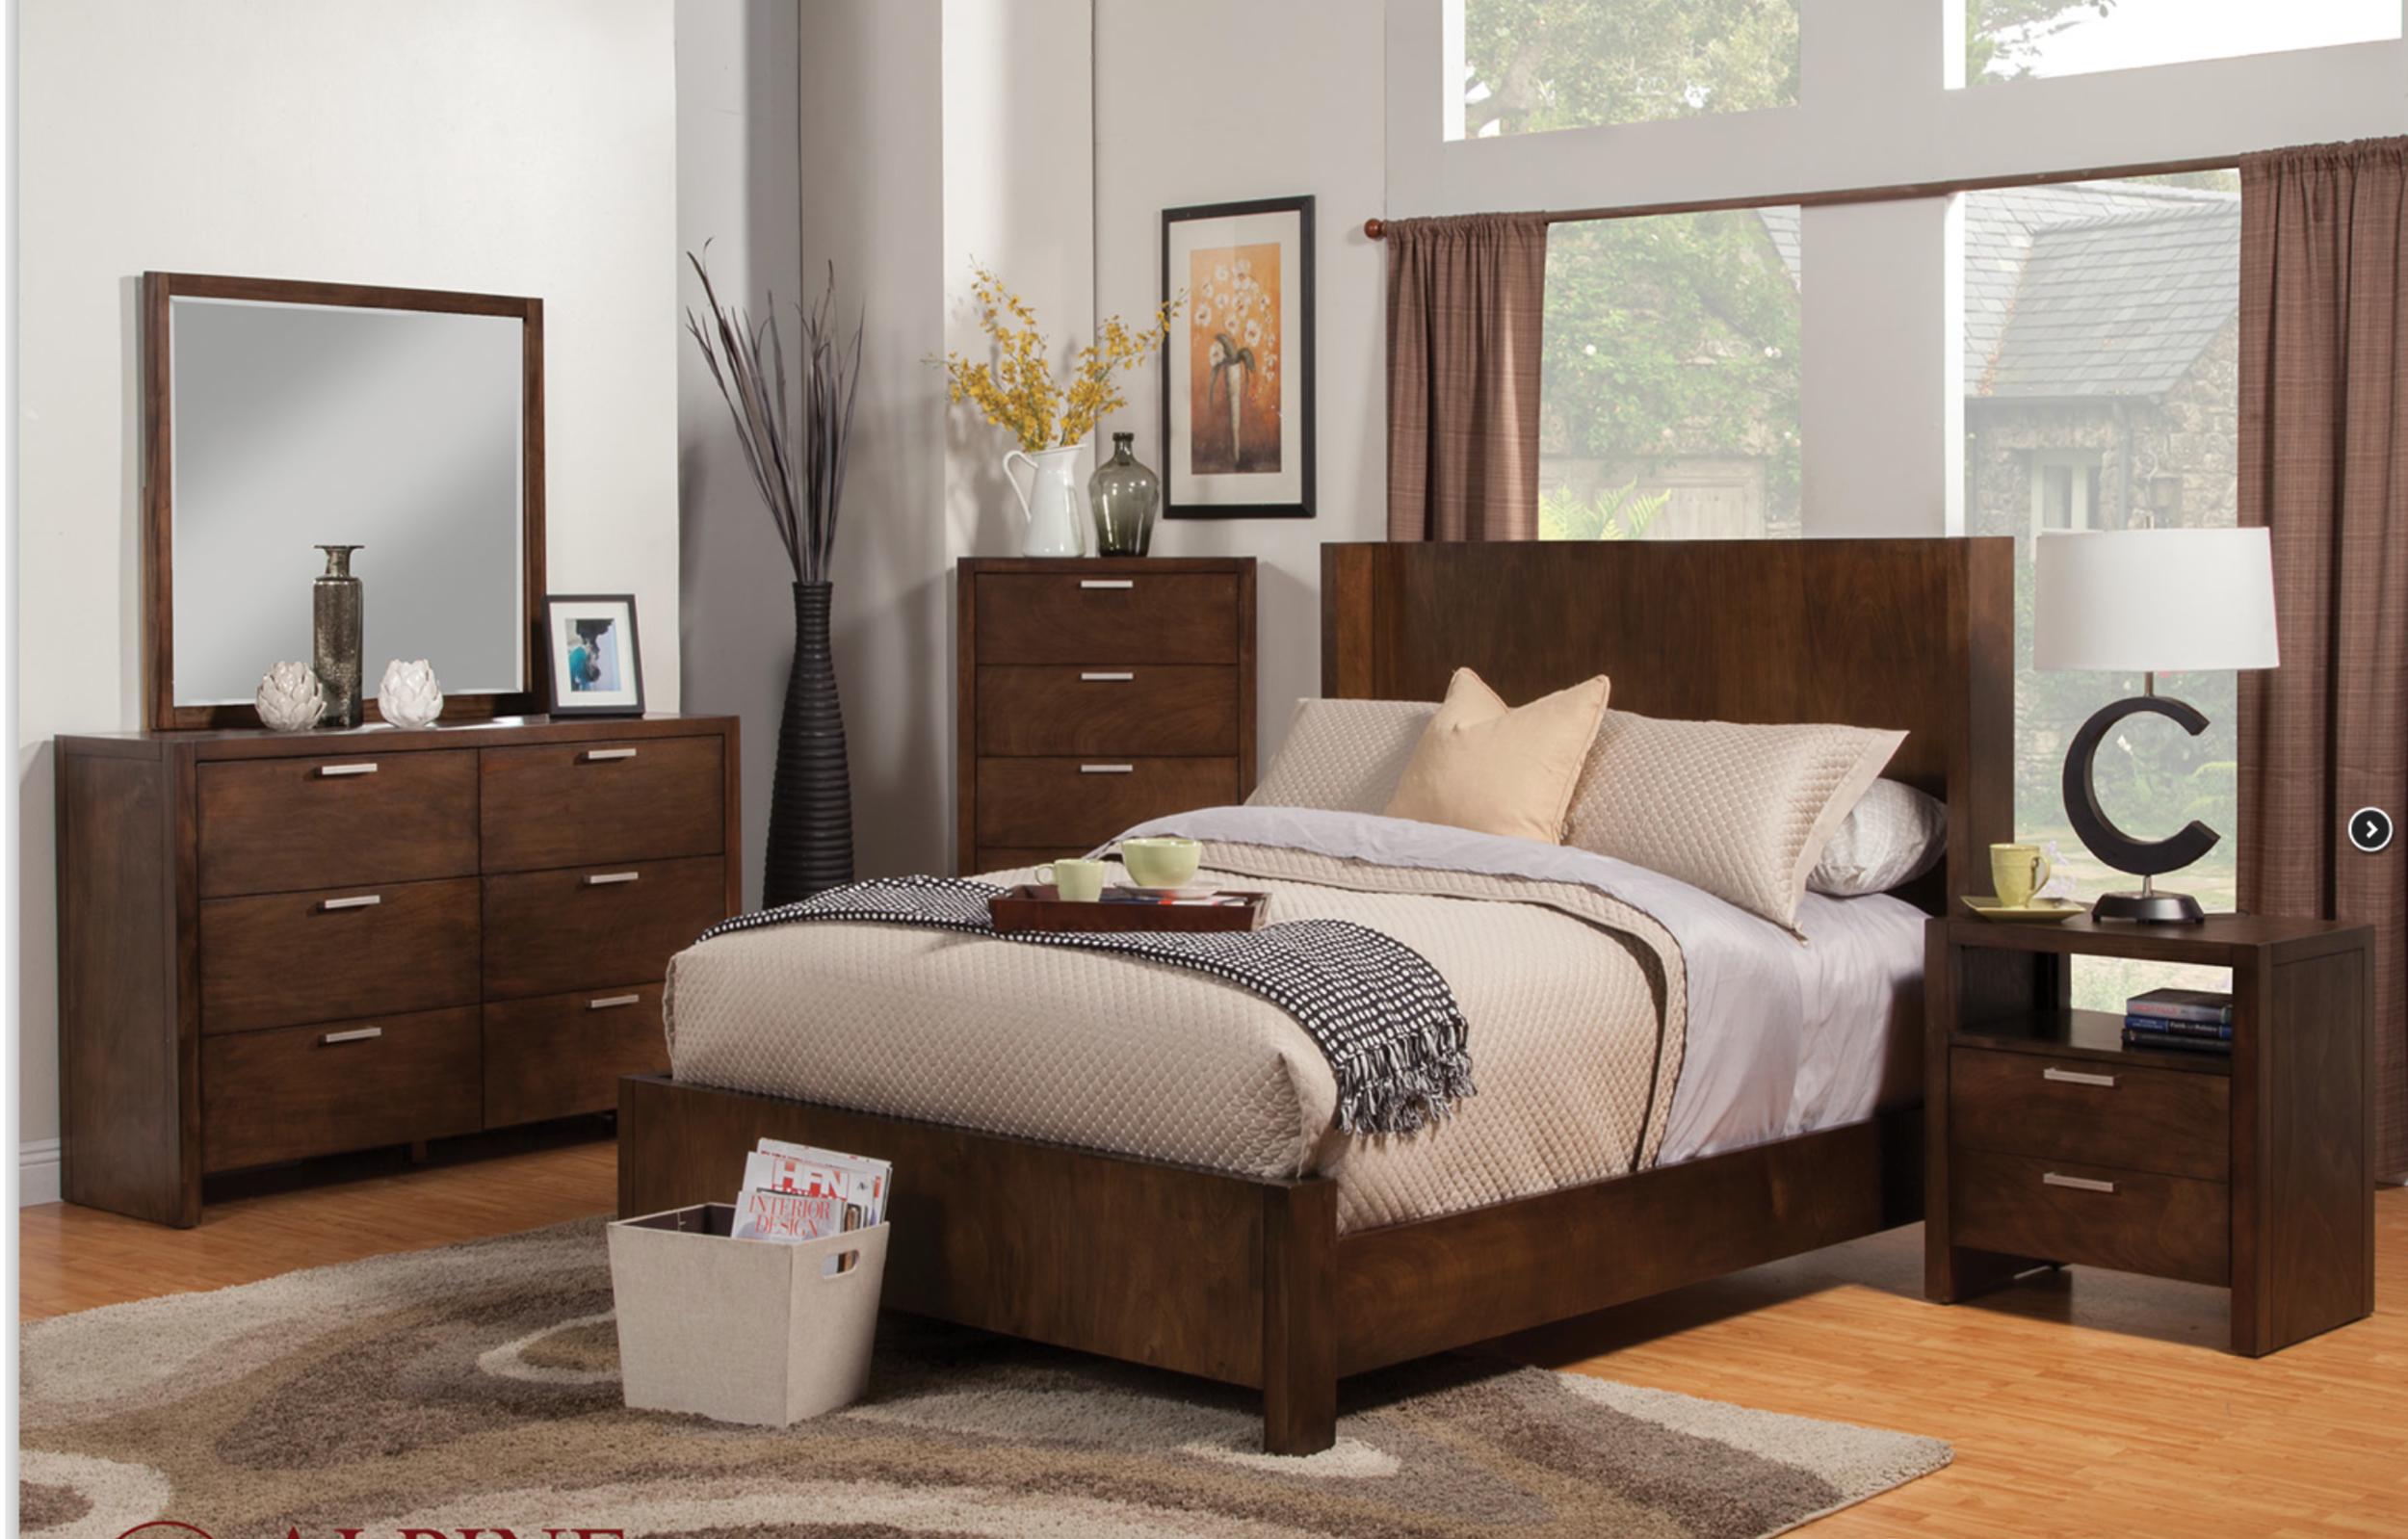 Alpine austin bedroom honolulu hawaii oahu discount furniture warehouse png